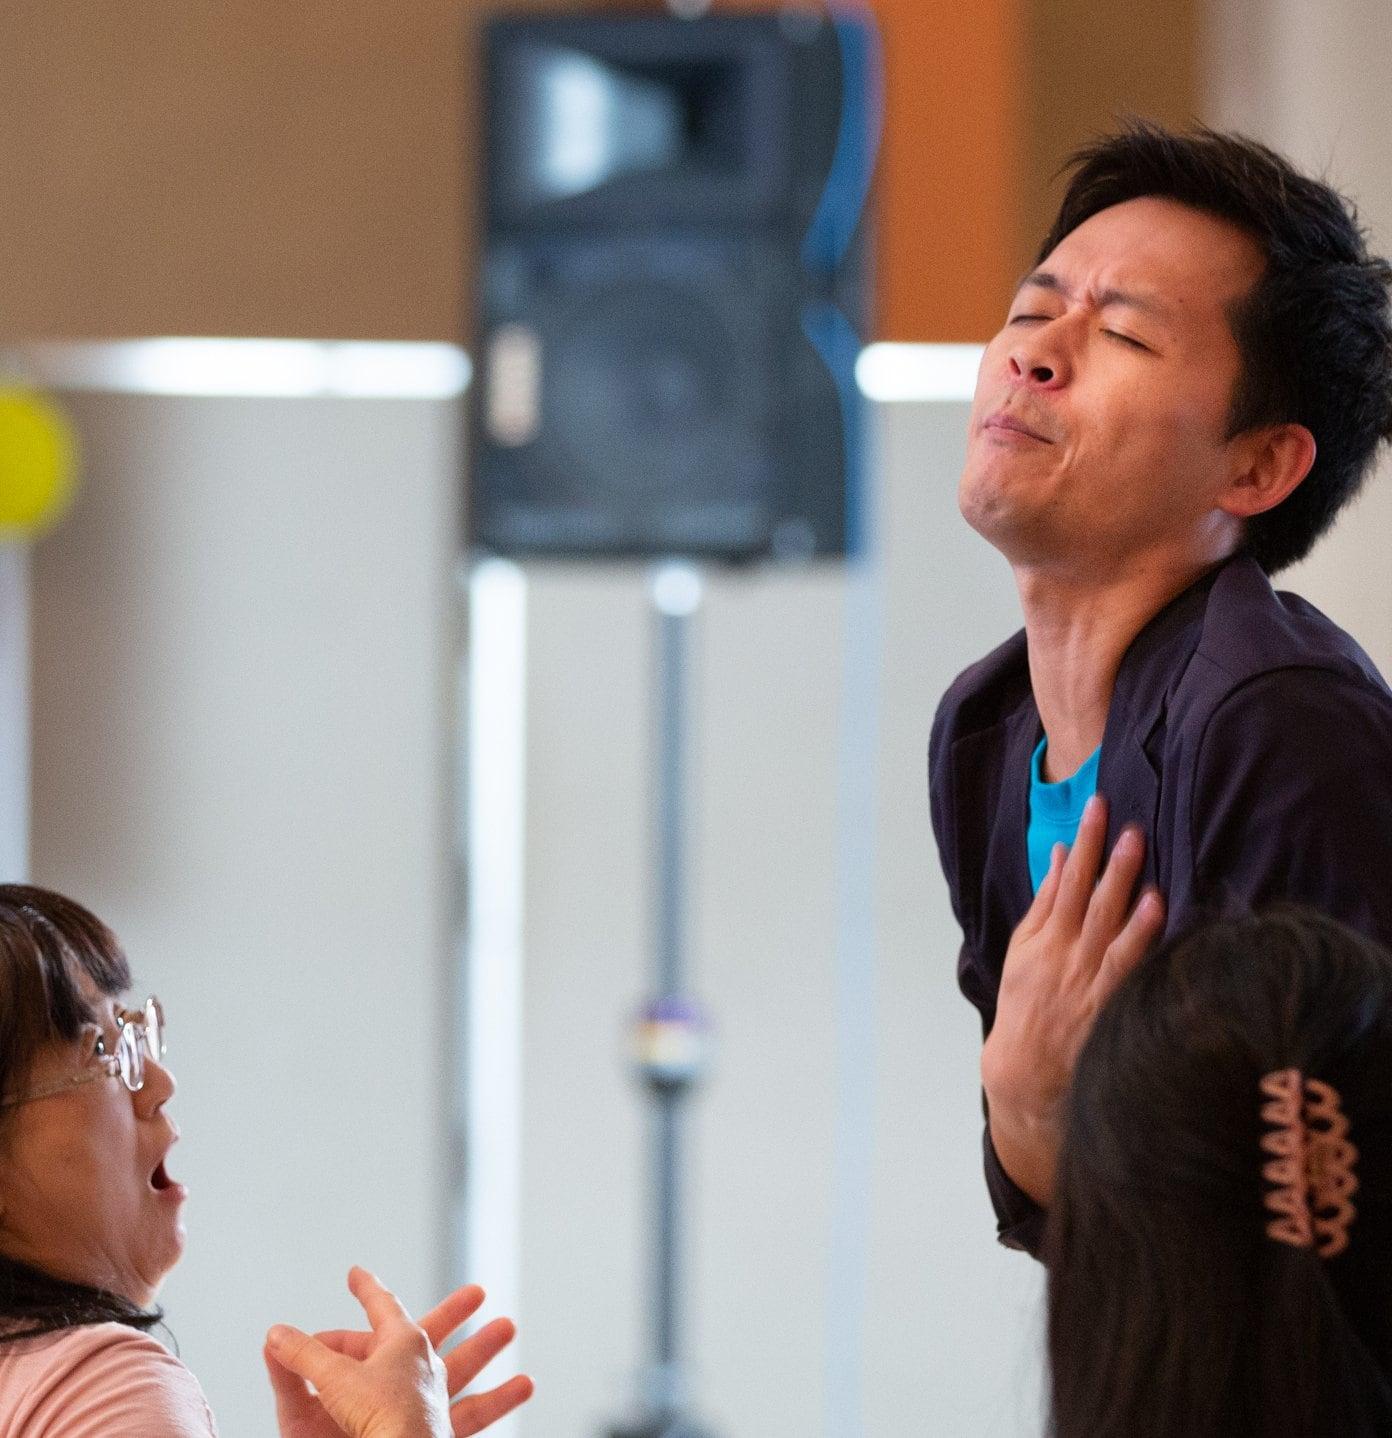 Dance in Heart 〜体躍る 心咲う〜《意味のないことから新しい自分に出会える 世界初、ジブリッシュ&身体表現法のコラボ企画!上杉真由×大久保信克》のイメージその5